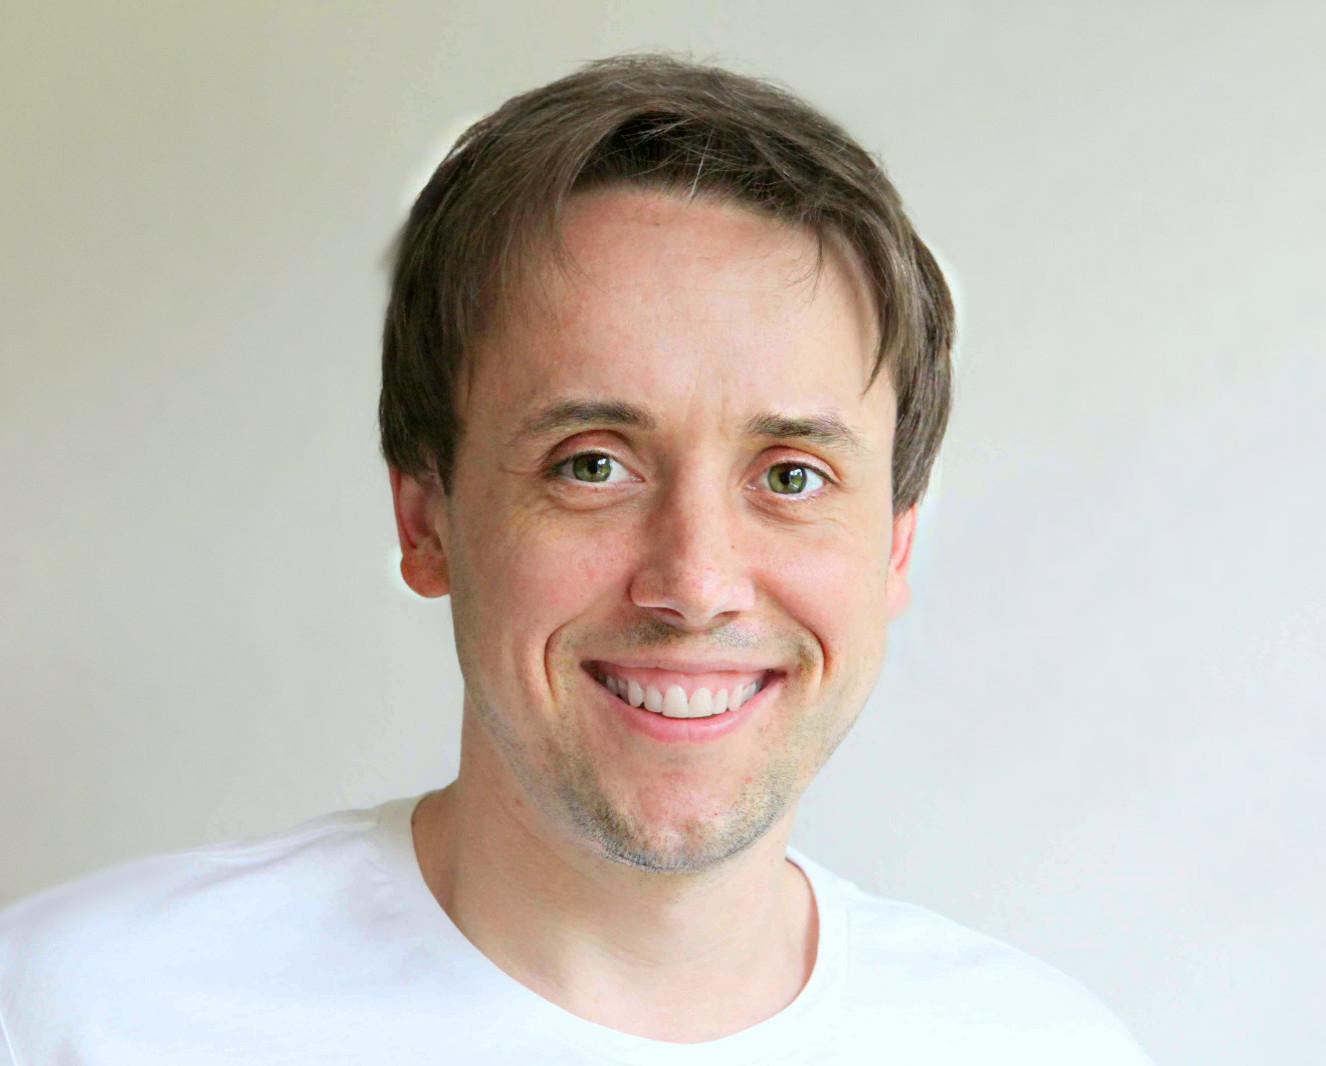 Michal Beil